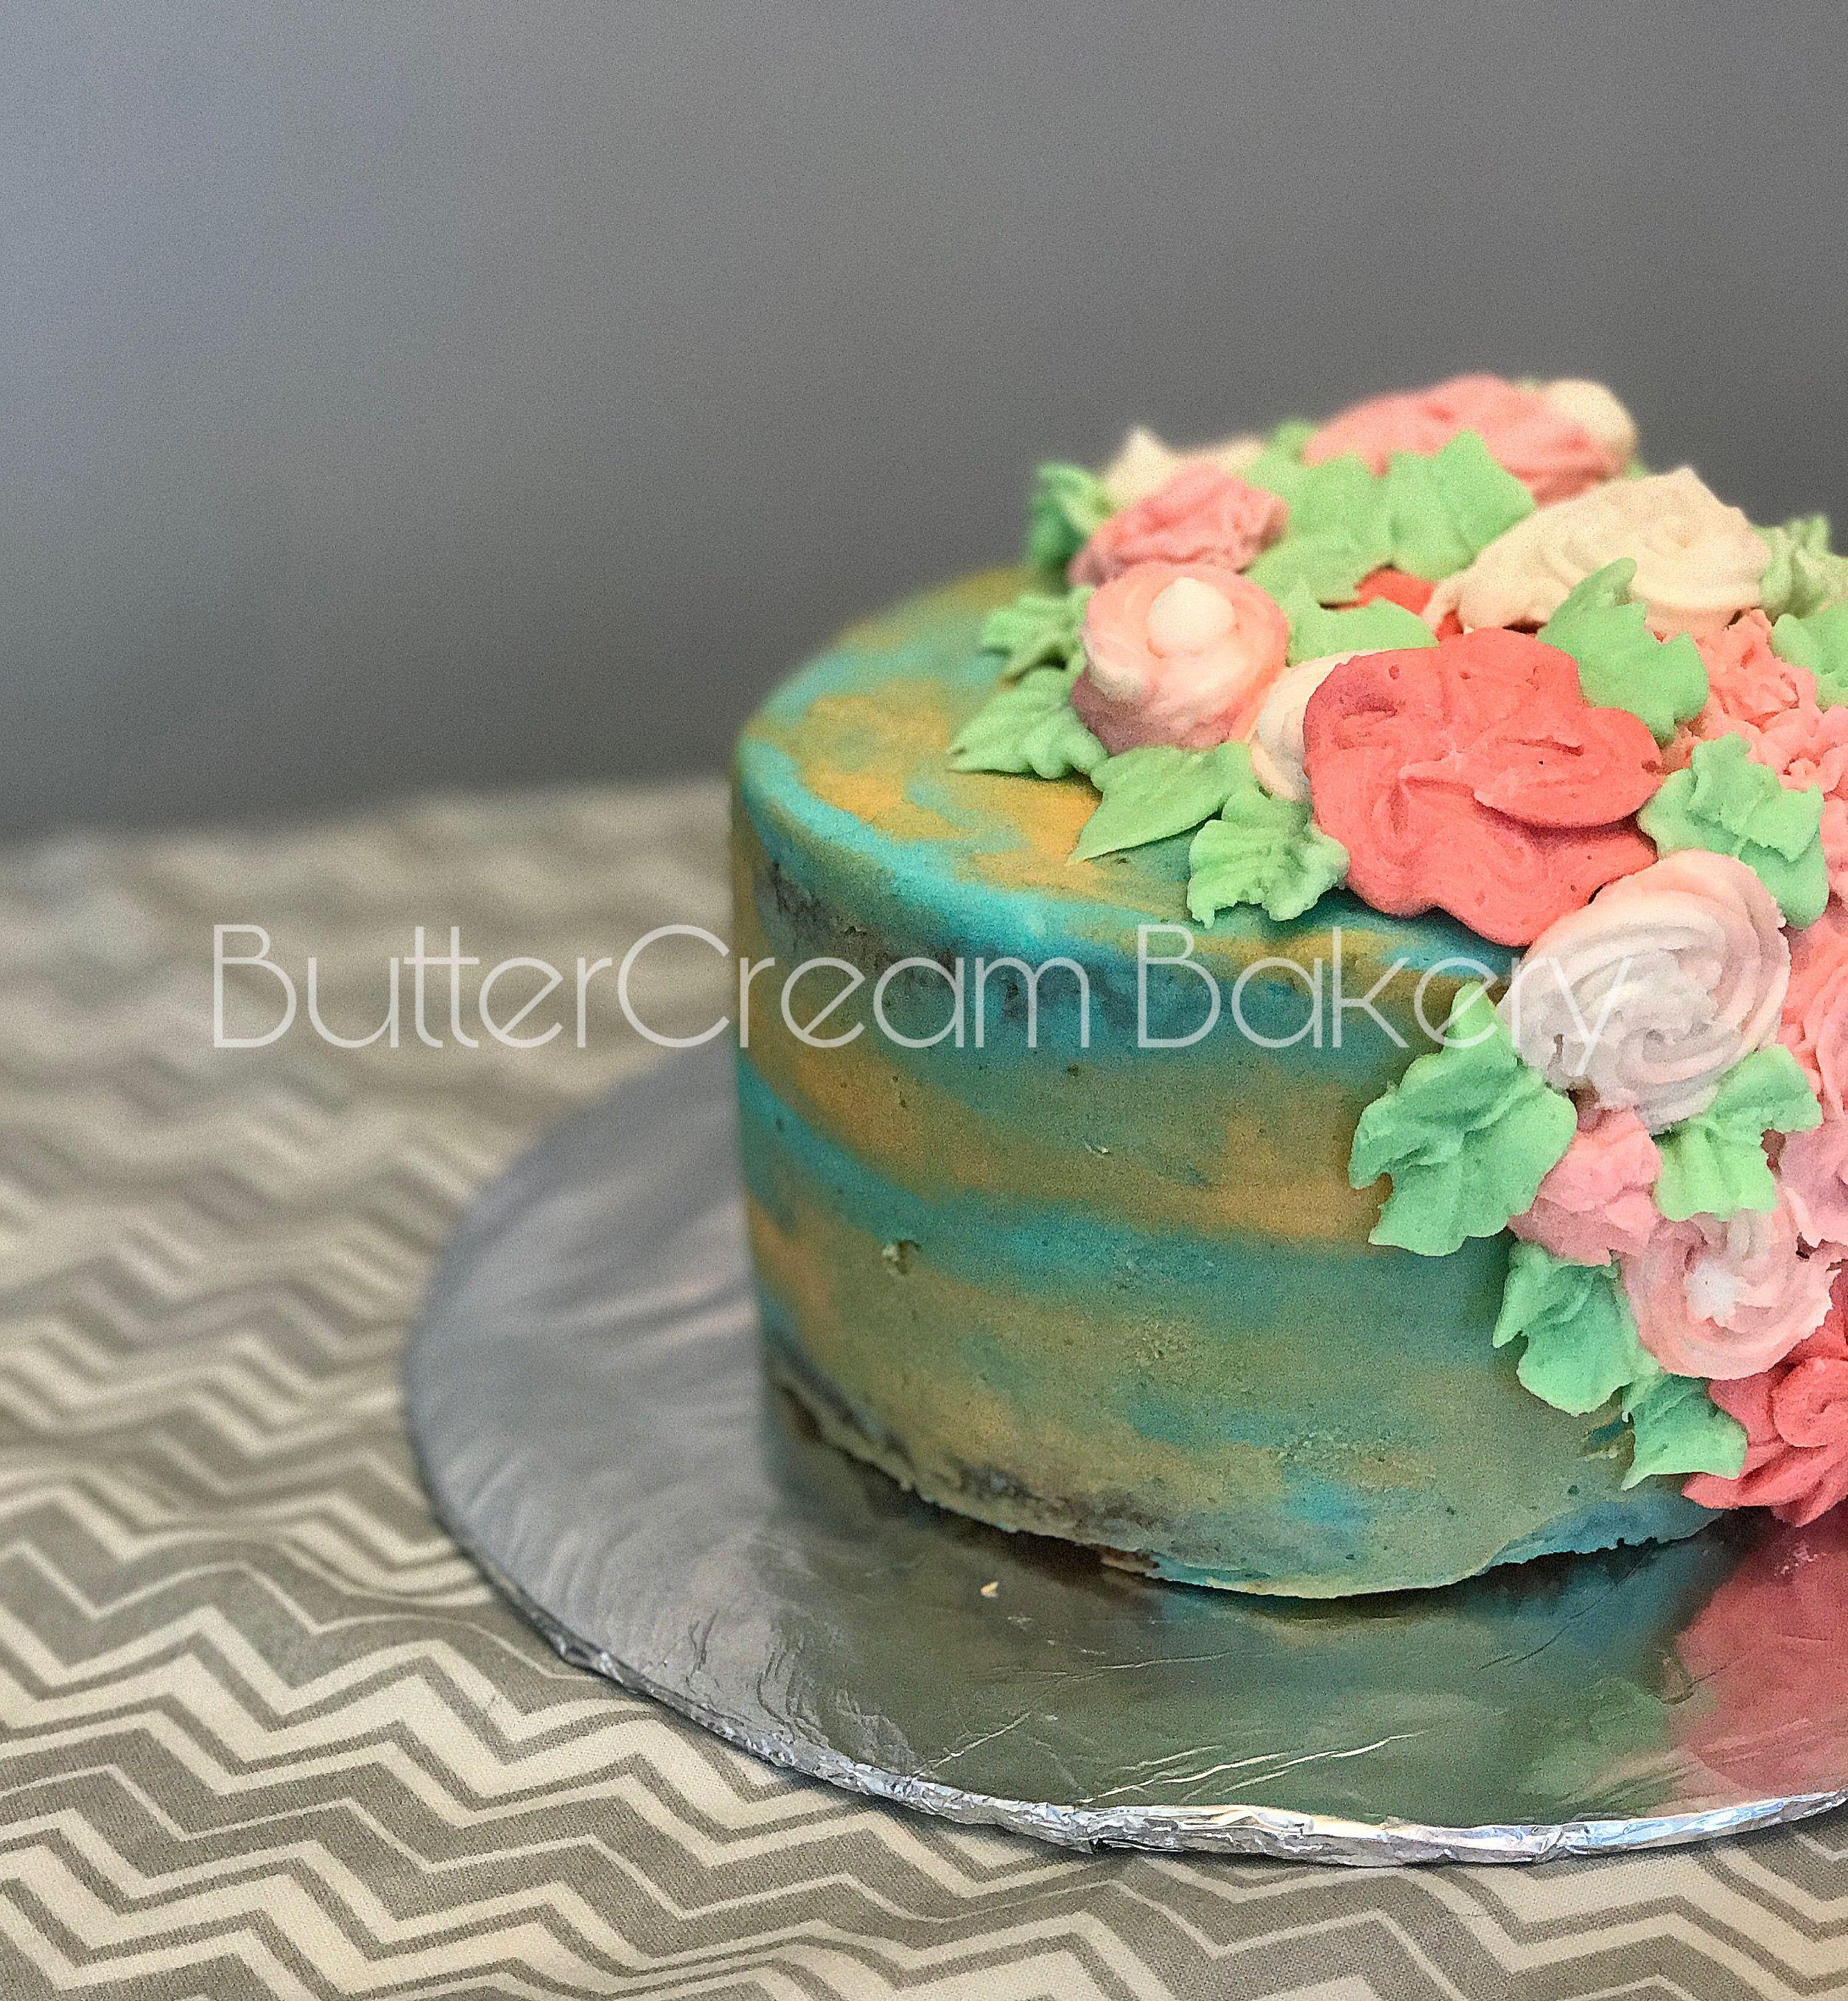 Cakelove Cake Cakes Cakestagram Cakedecorating Cakeart